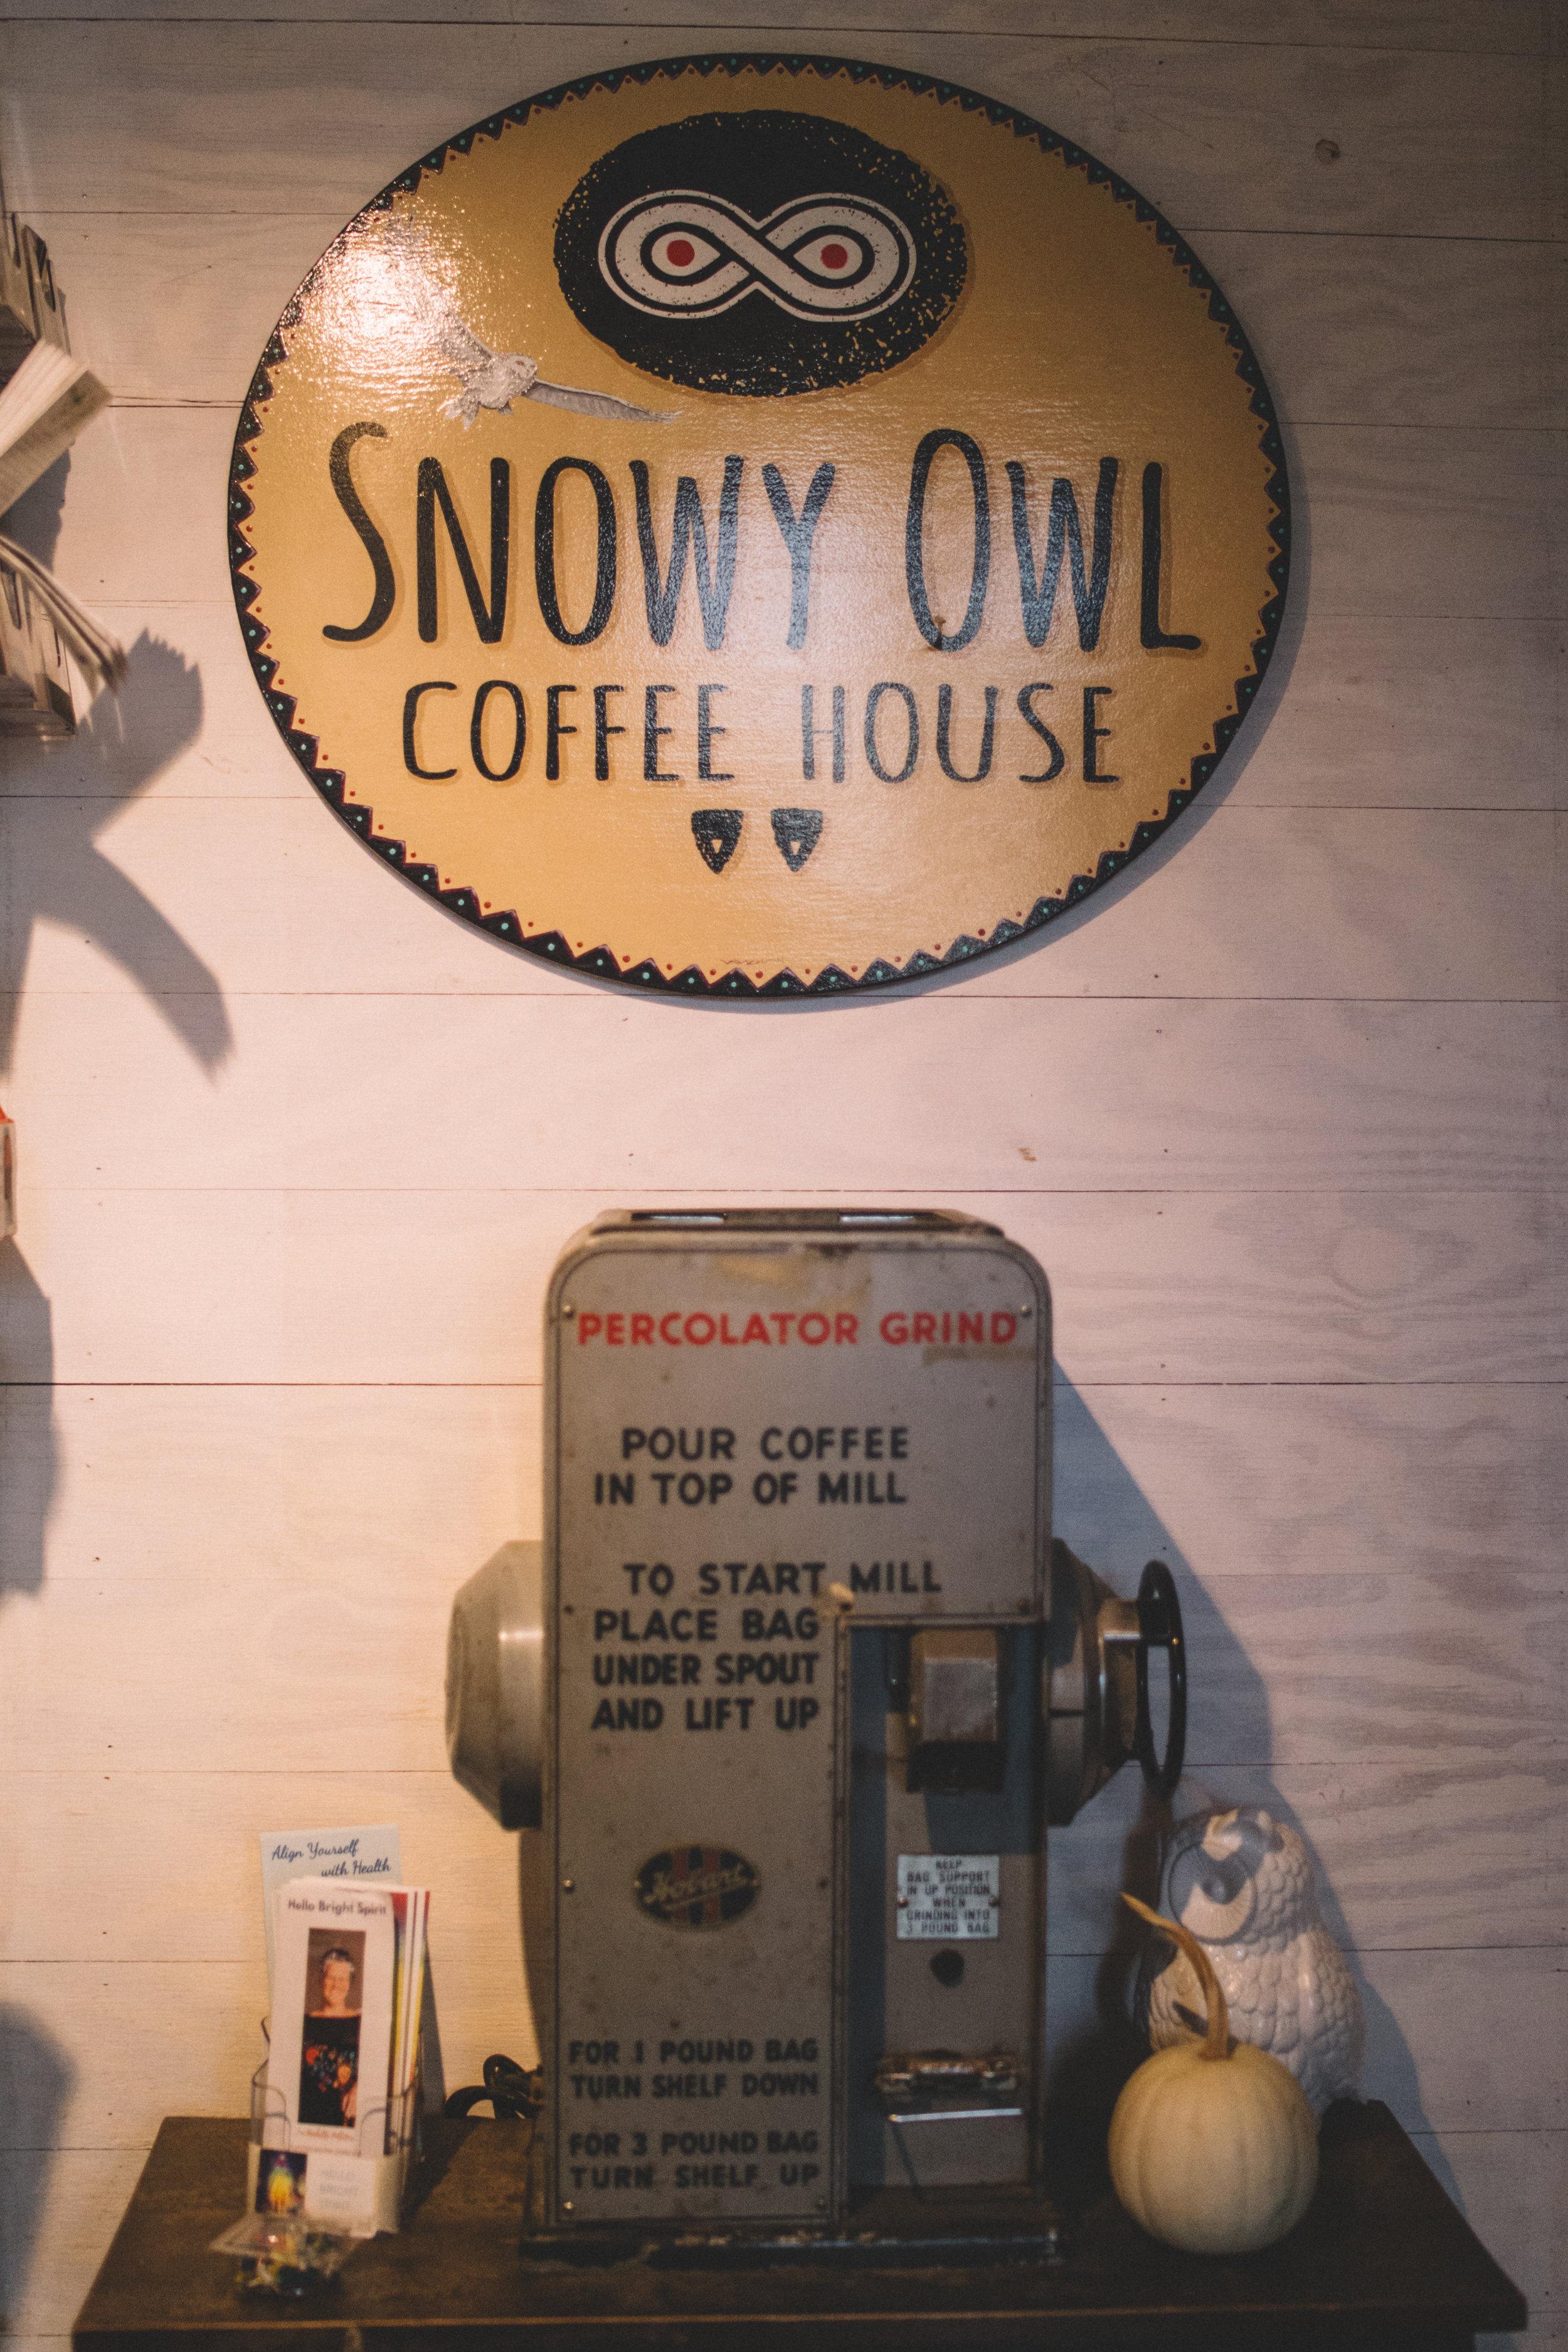 TPC-SnowyOwl-33.jpg